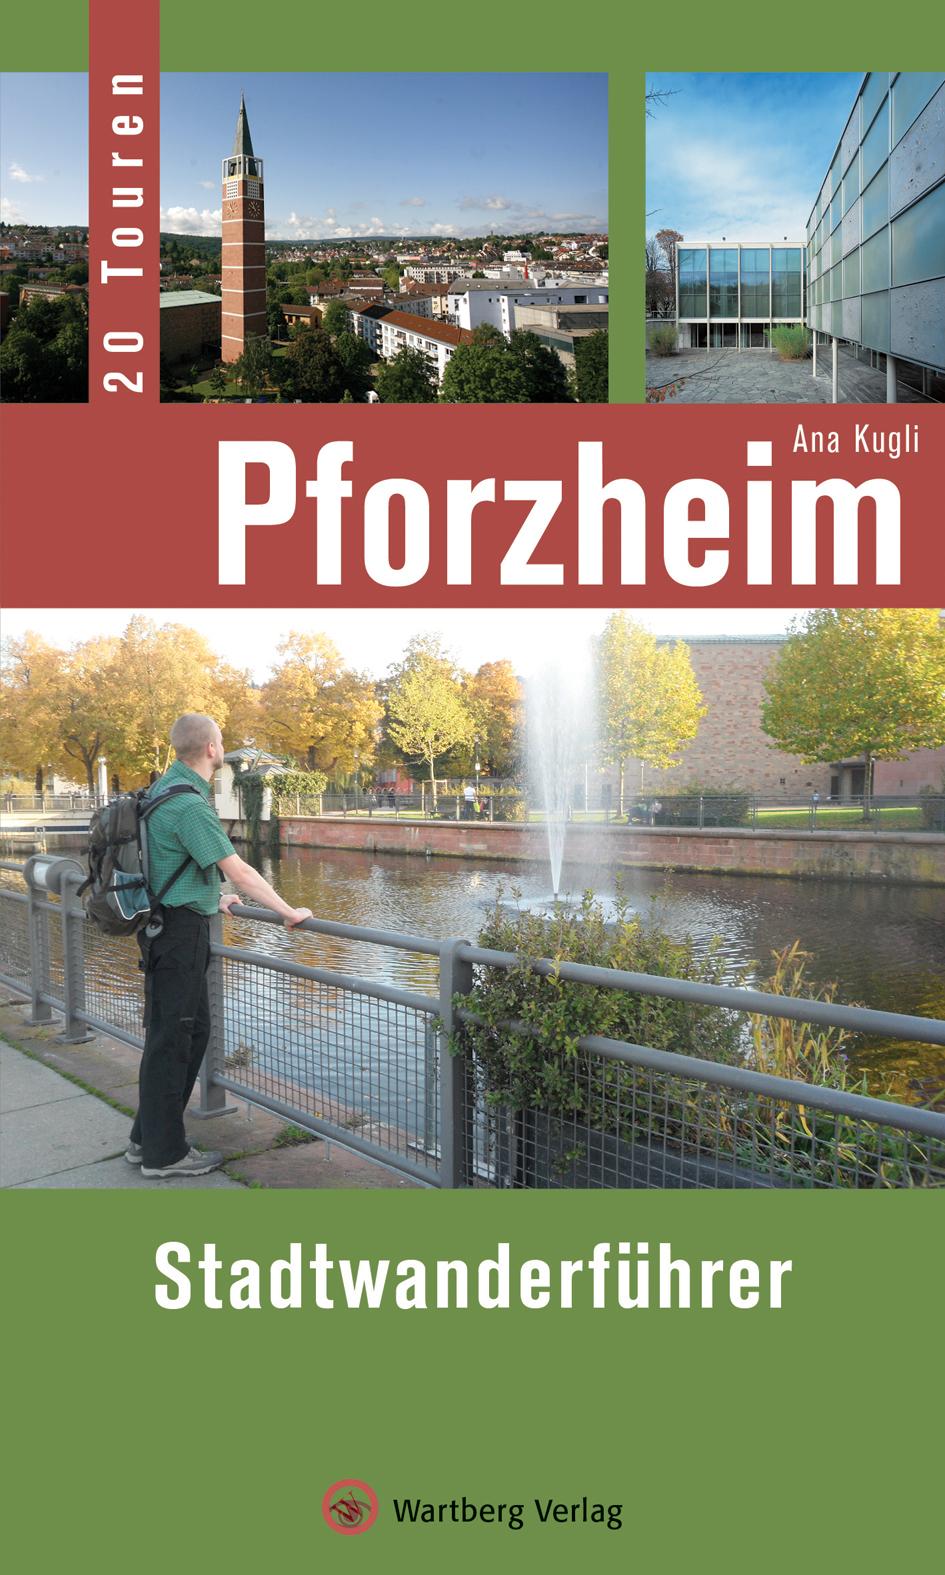 Pforzheim - Stadtwanderführer - Ana Kugli